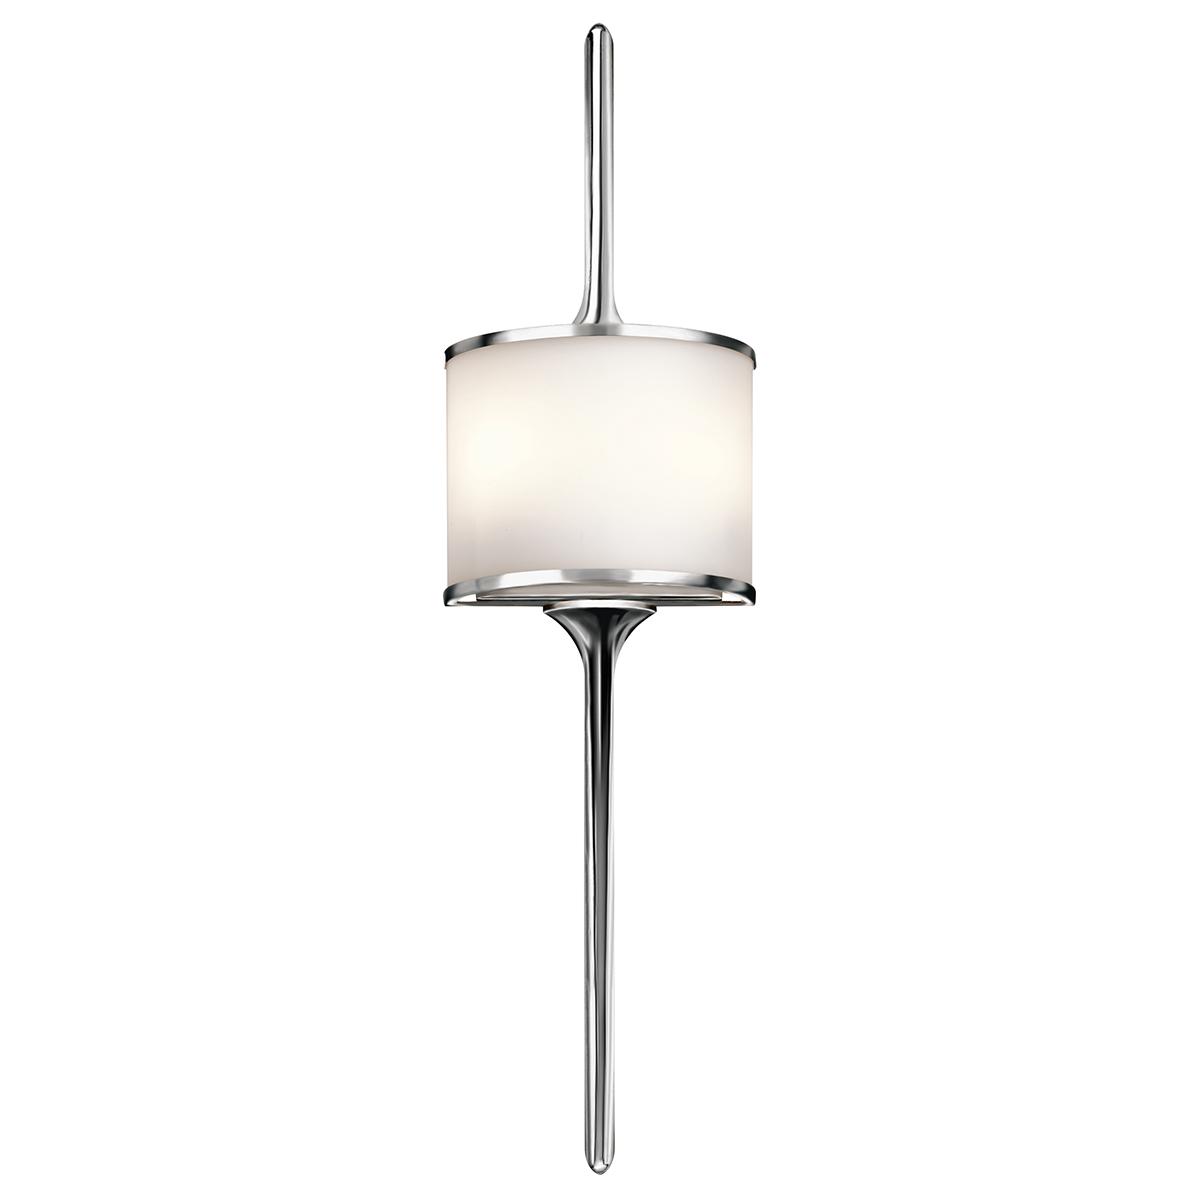 Wandleuchte Bade ARYA Chrom B:20cm Bad Lampe